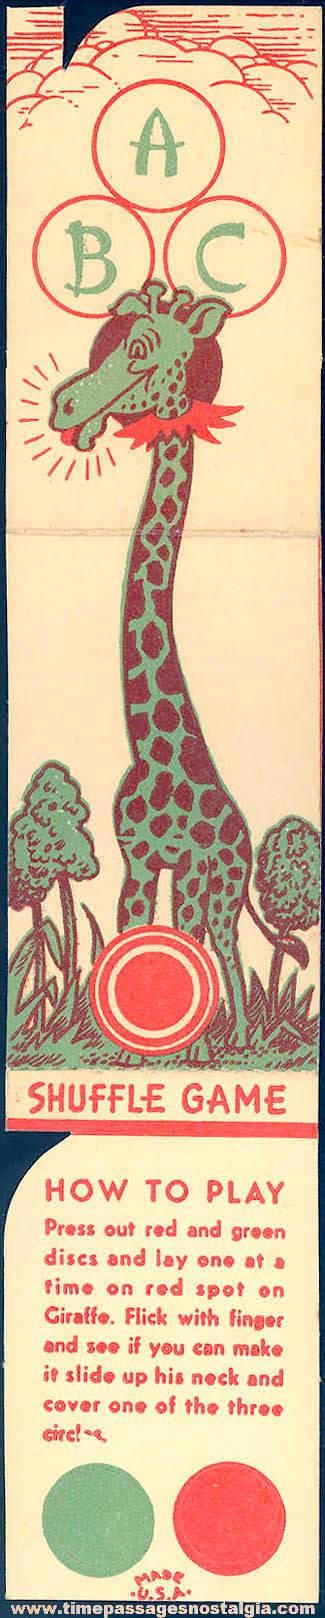 Unused 1930s Cracker Jack Pop Corn Confection C. Carey Cloud Giraffe Shuffle Board Game Paper Prize